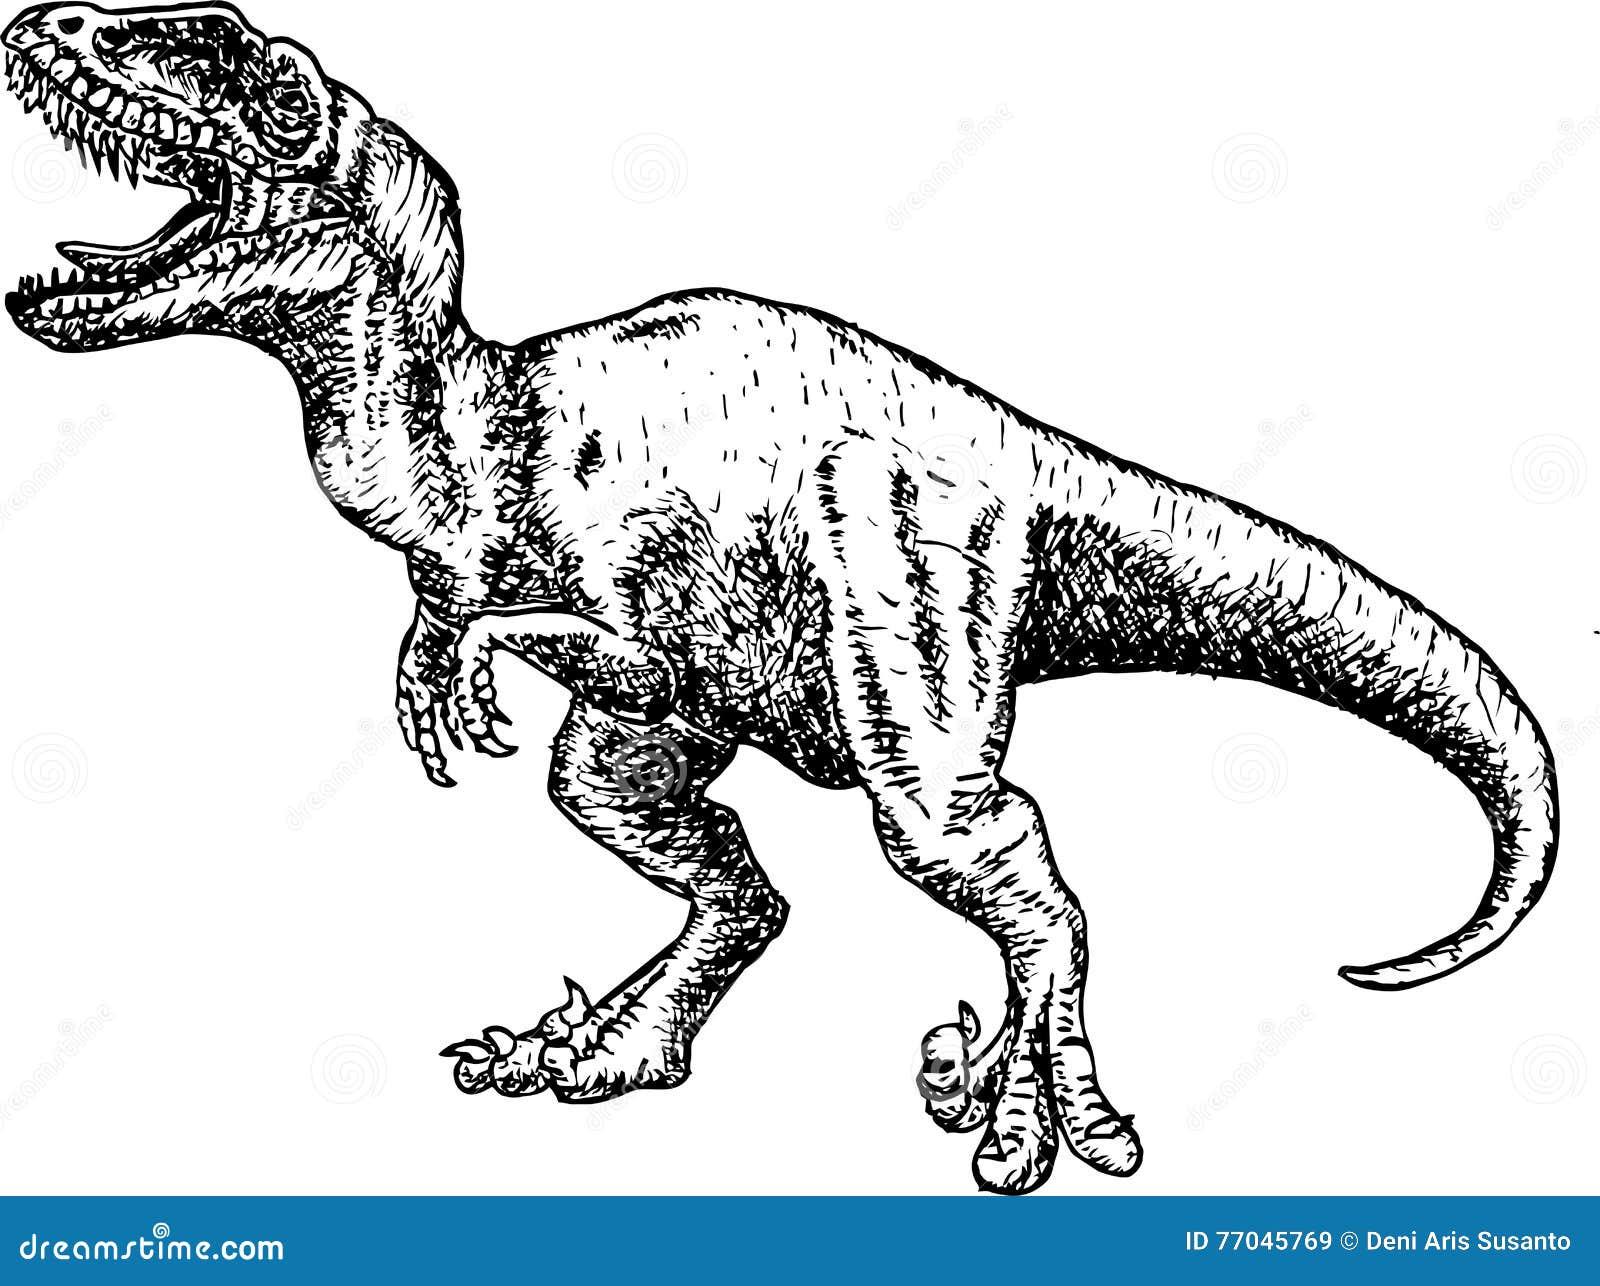 T rex dinosaur croquis de crayon de dessin de dinosaure - Dessin dinosaure t rex ...